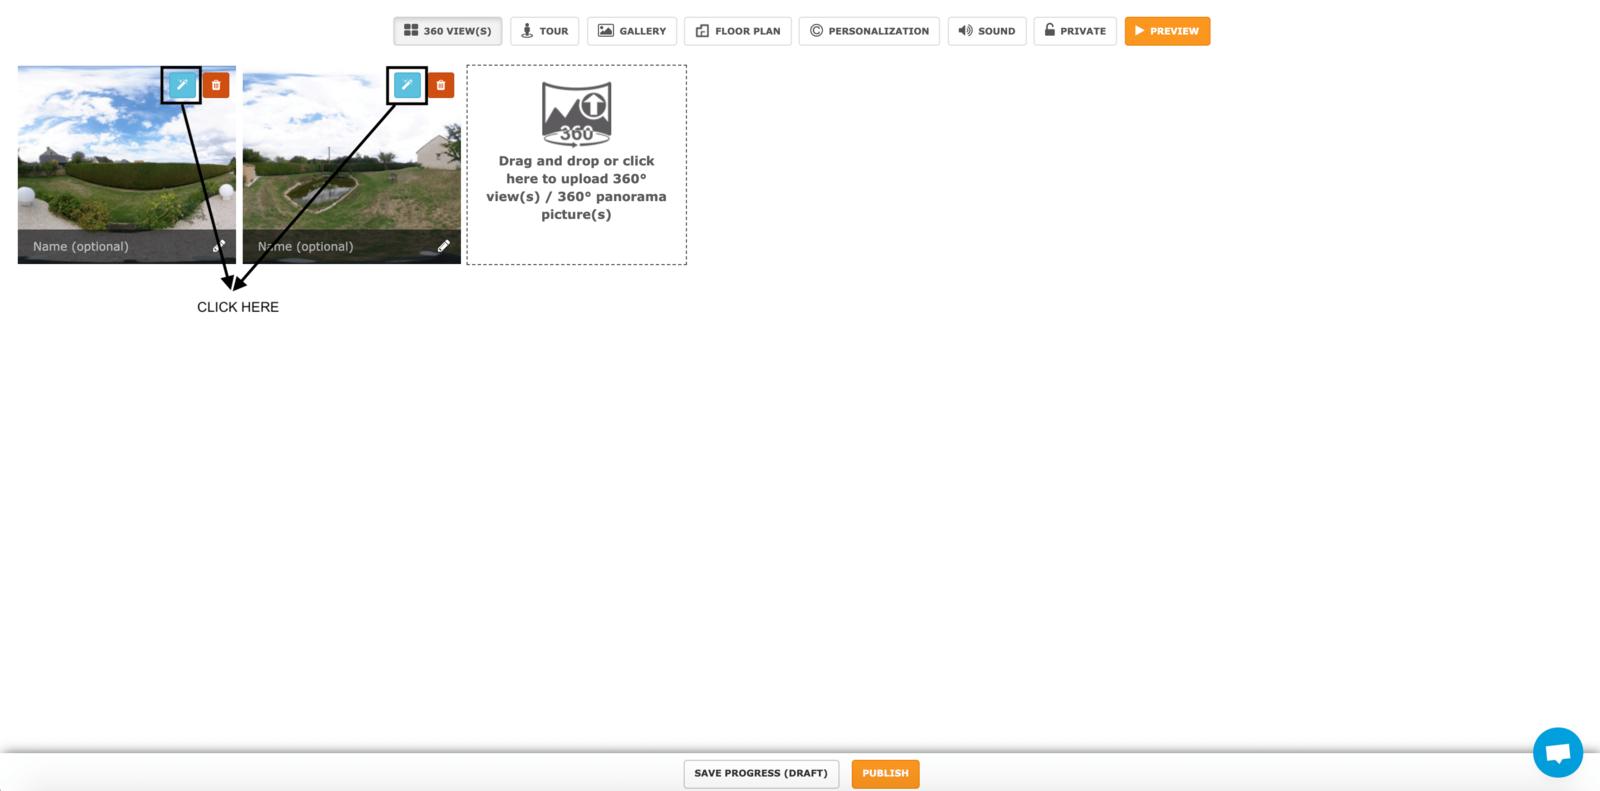 Step 2 - Enhancing a 360 virtual tour's photos